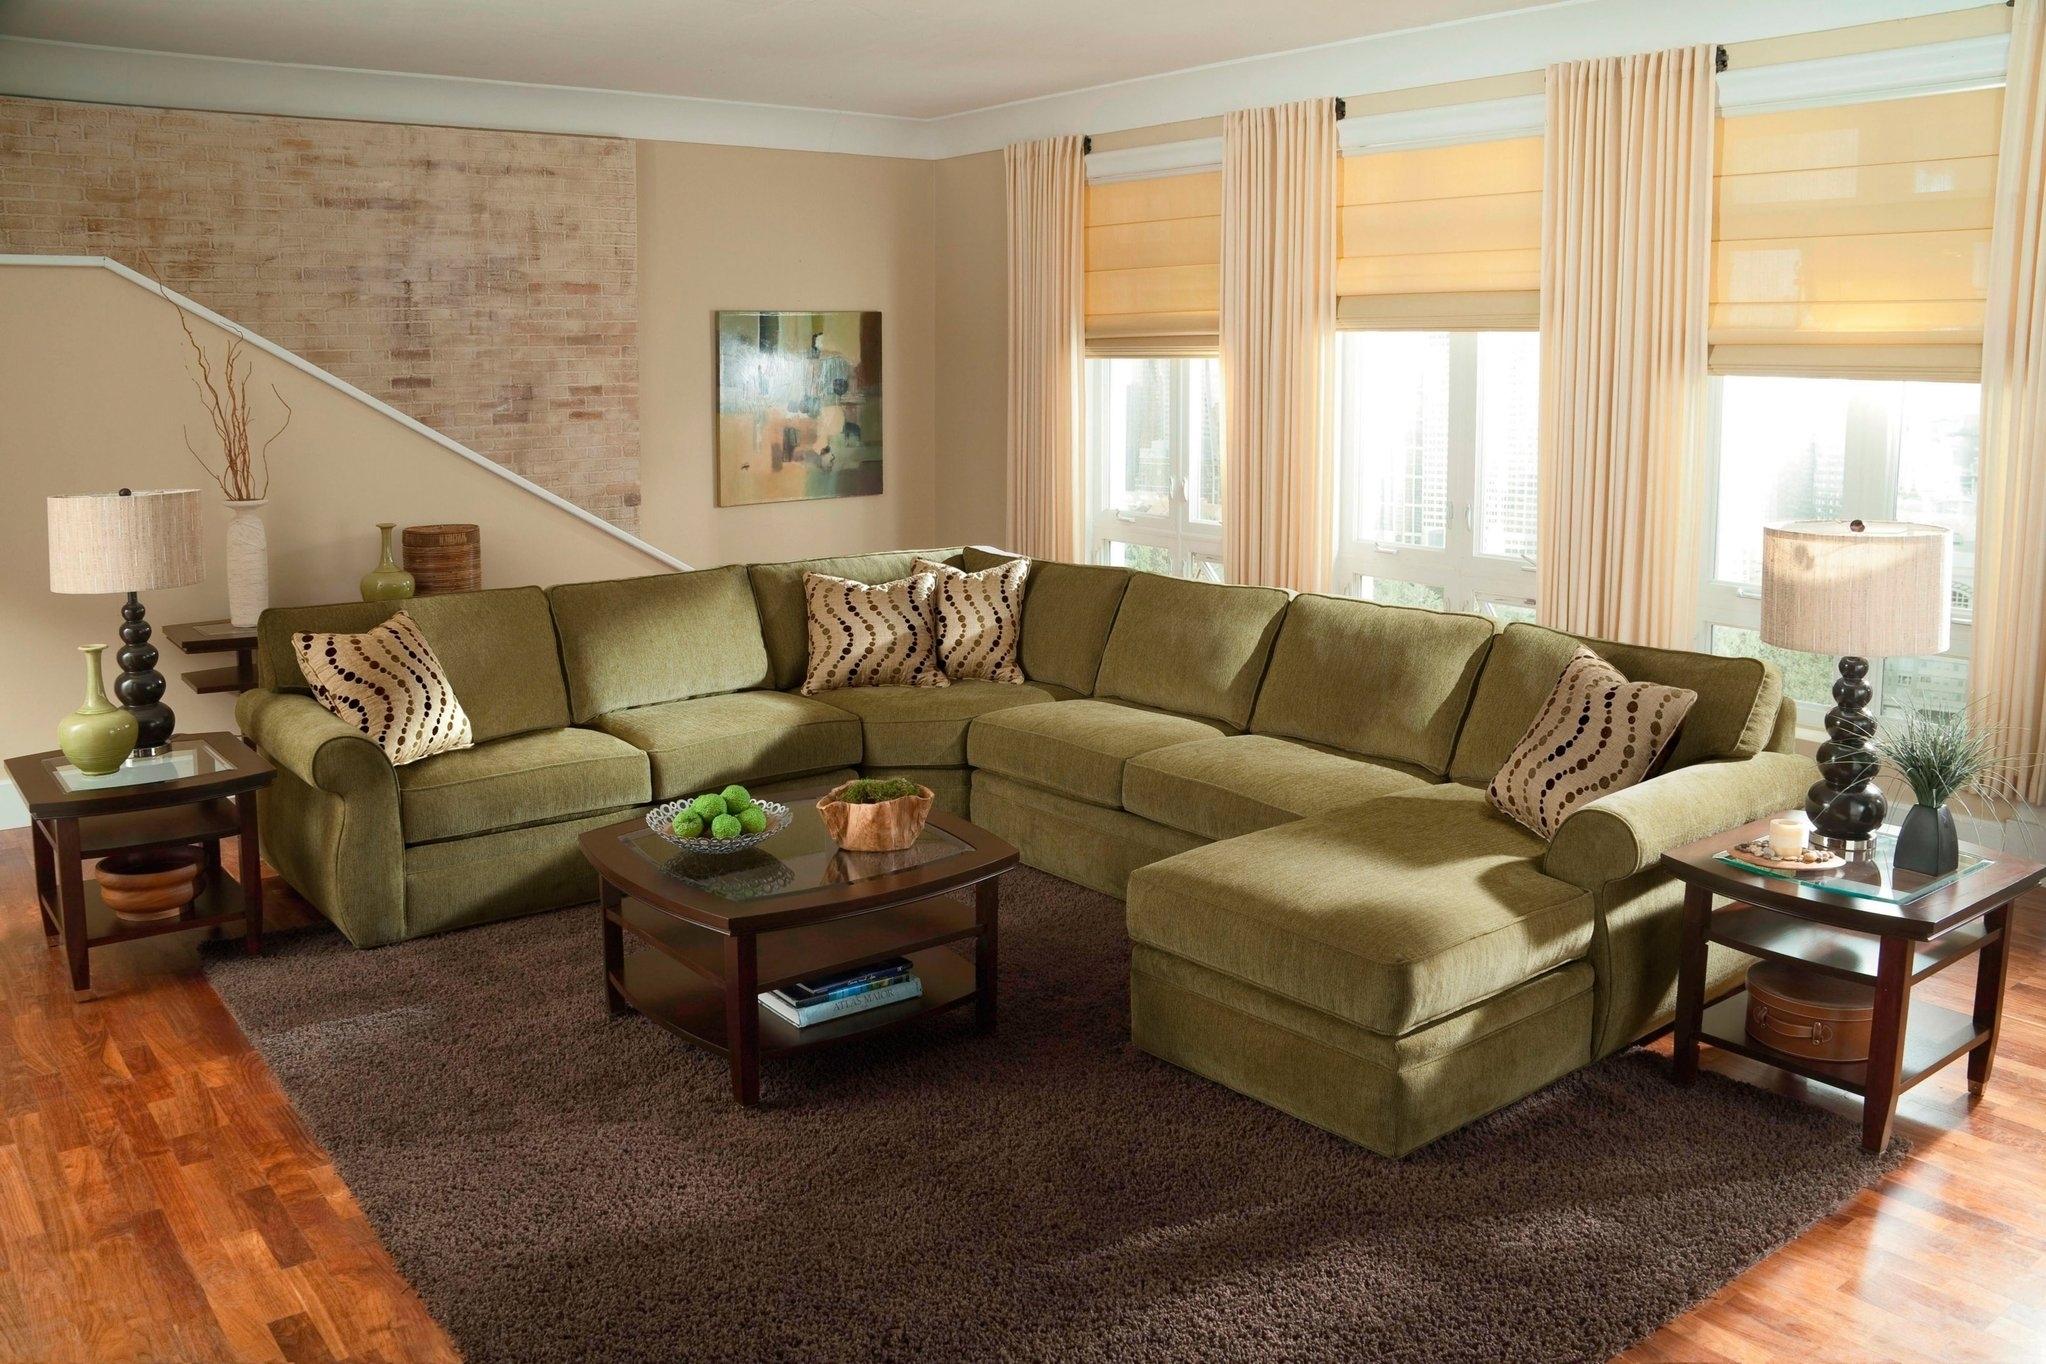 Large Scale U Shaped Sectional Sofa Set | Many Fabric Options 11410 with regard to Extra Large U Shaped Sectionals (Image 11 of 15)